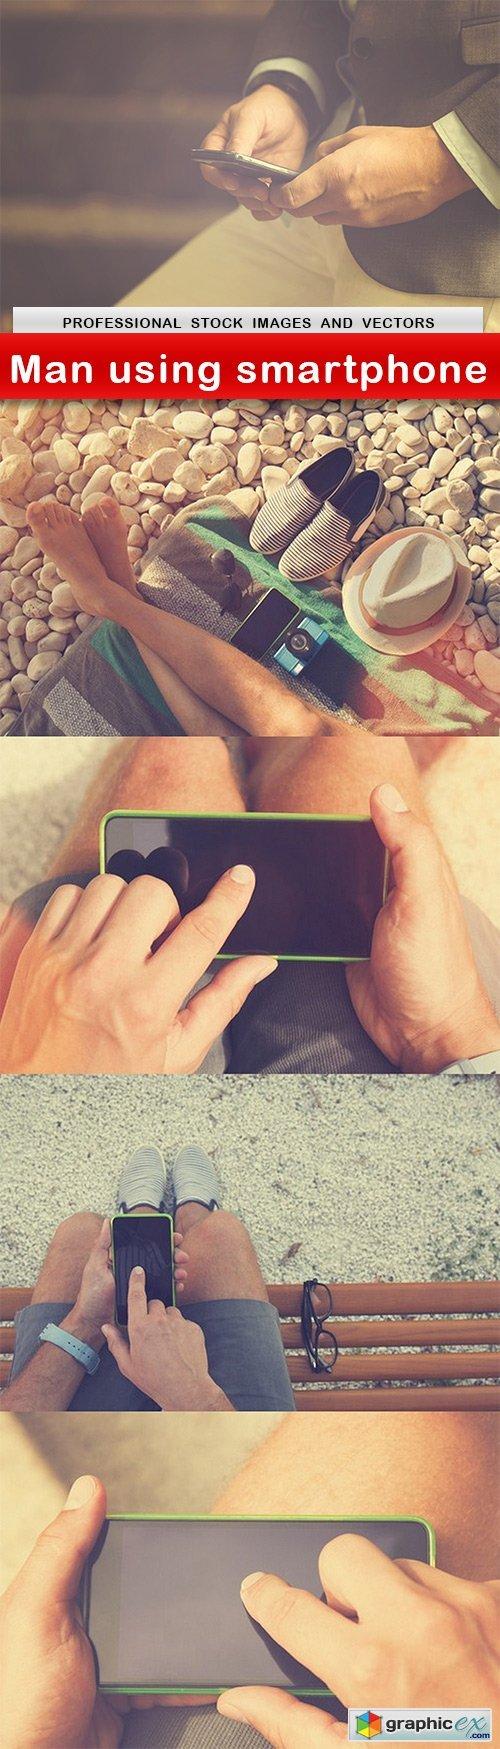 Man using smartphone - 5 UHQ JPEG